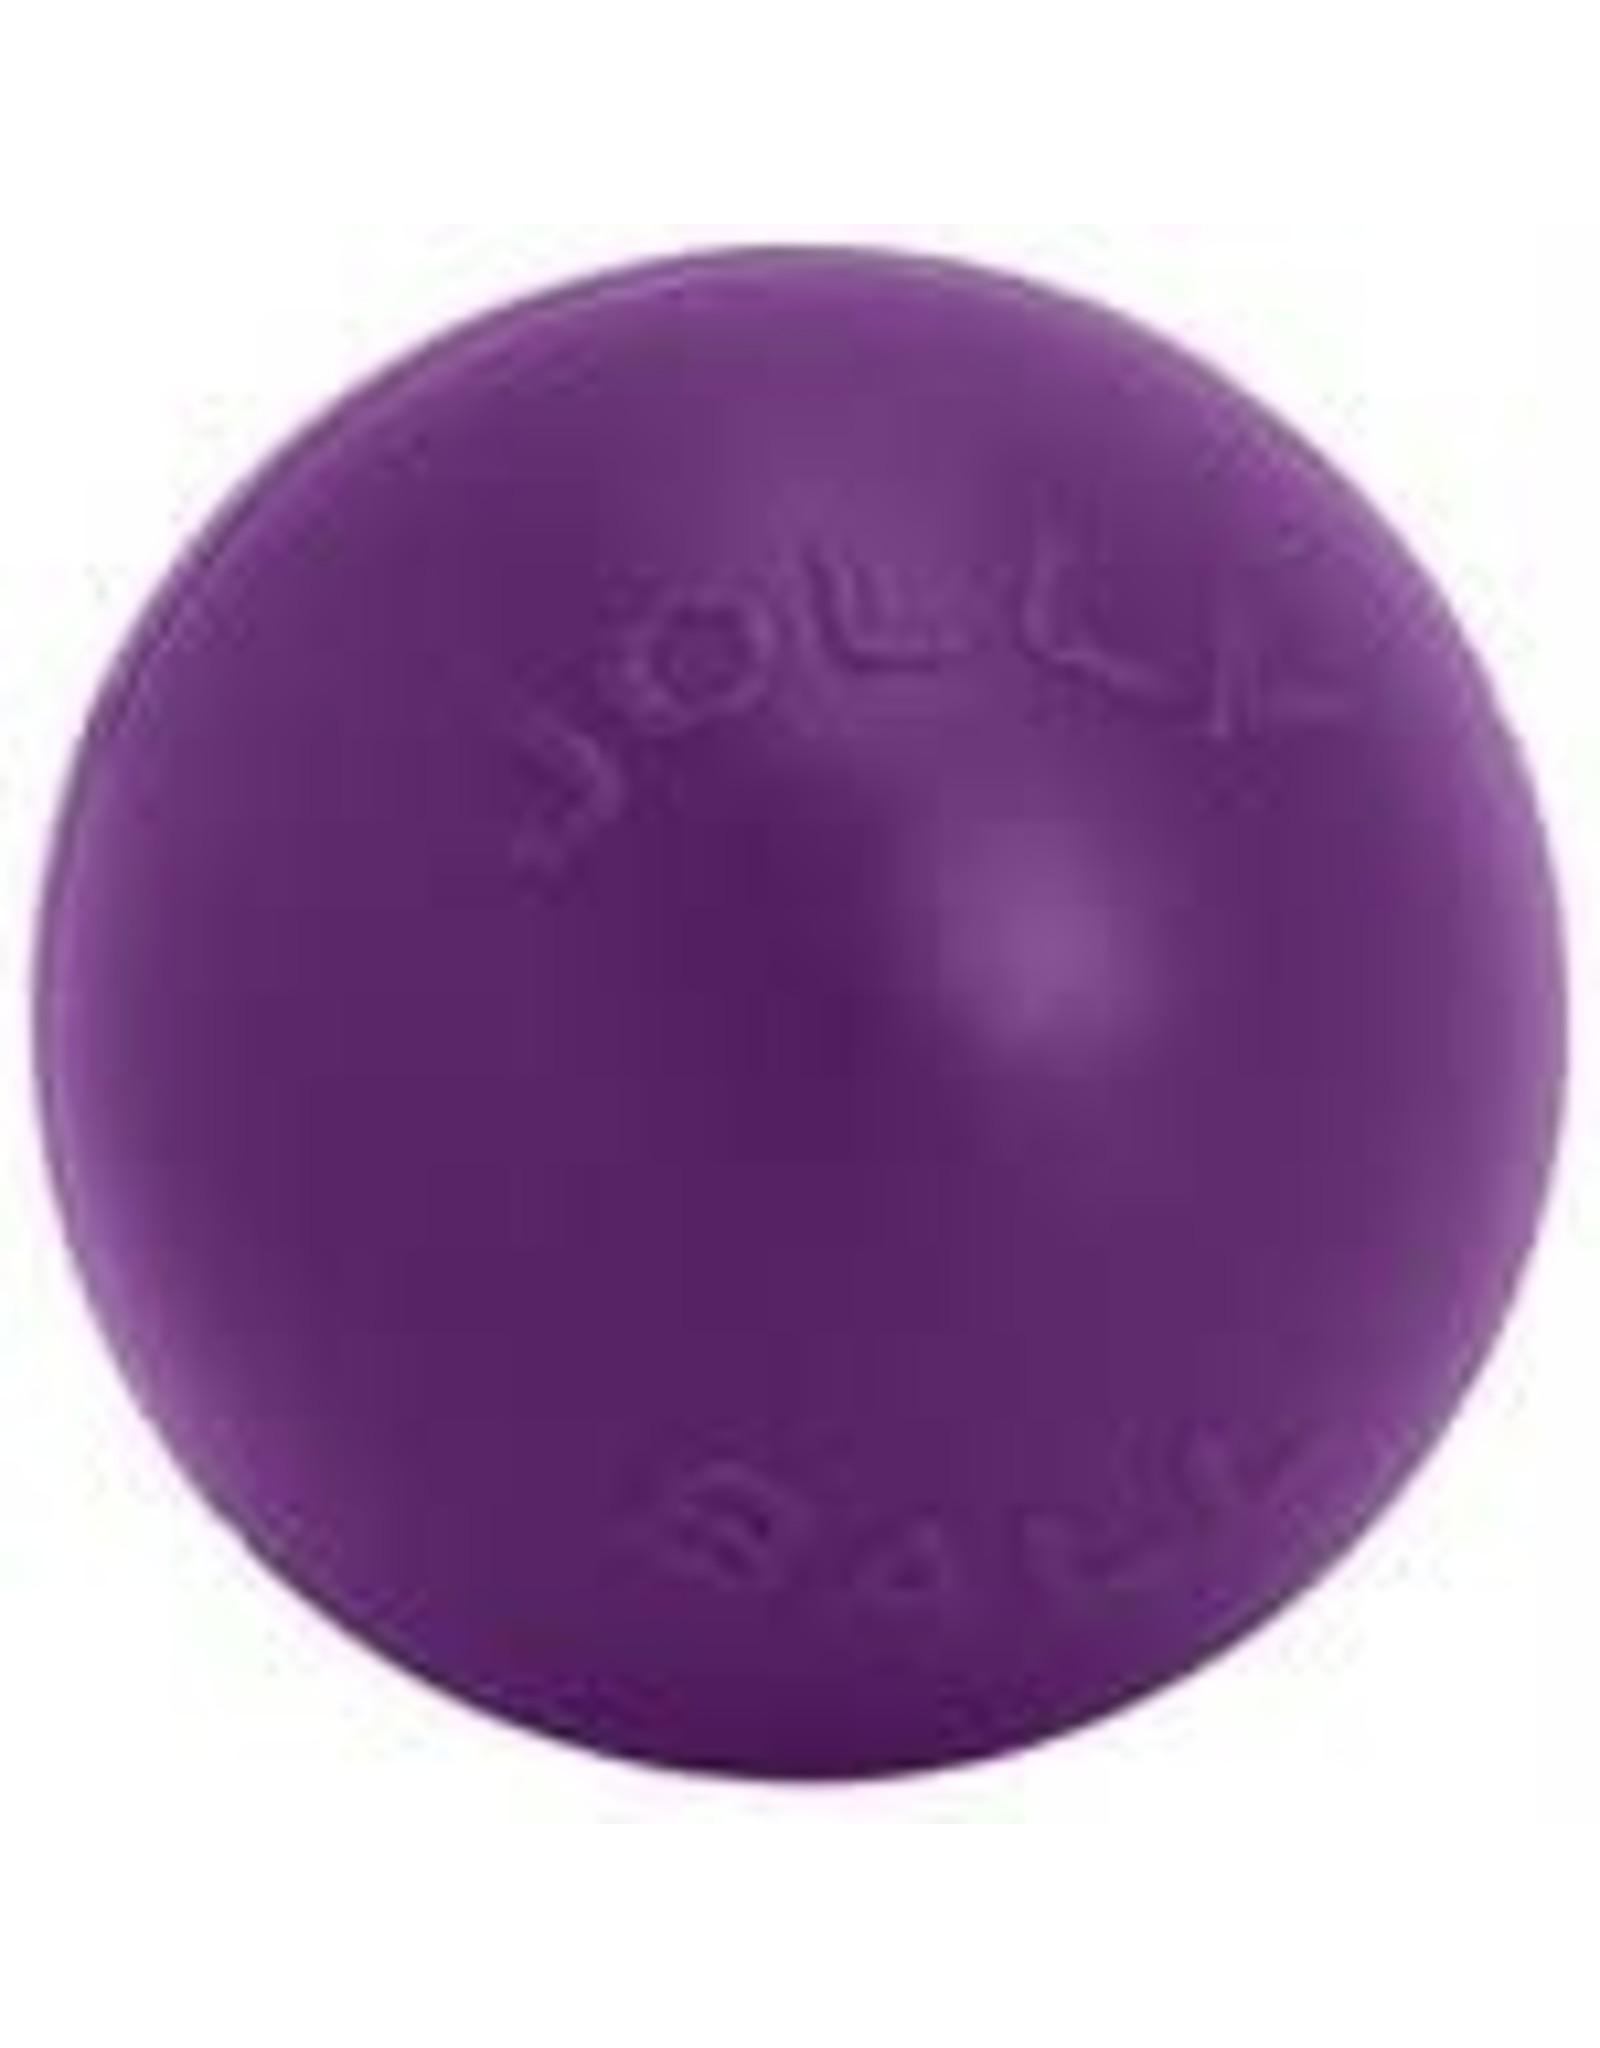 Jolly Pet JOLLYPET Push-n-Play 4.5in Purple